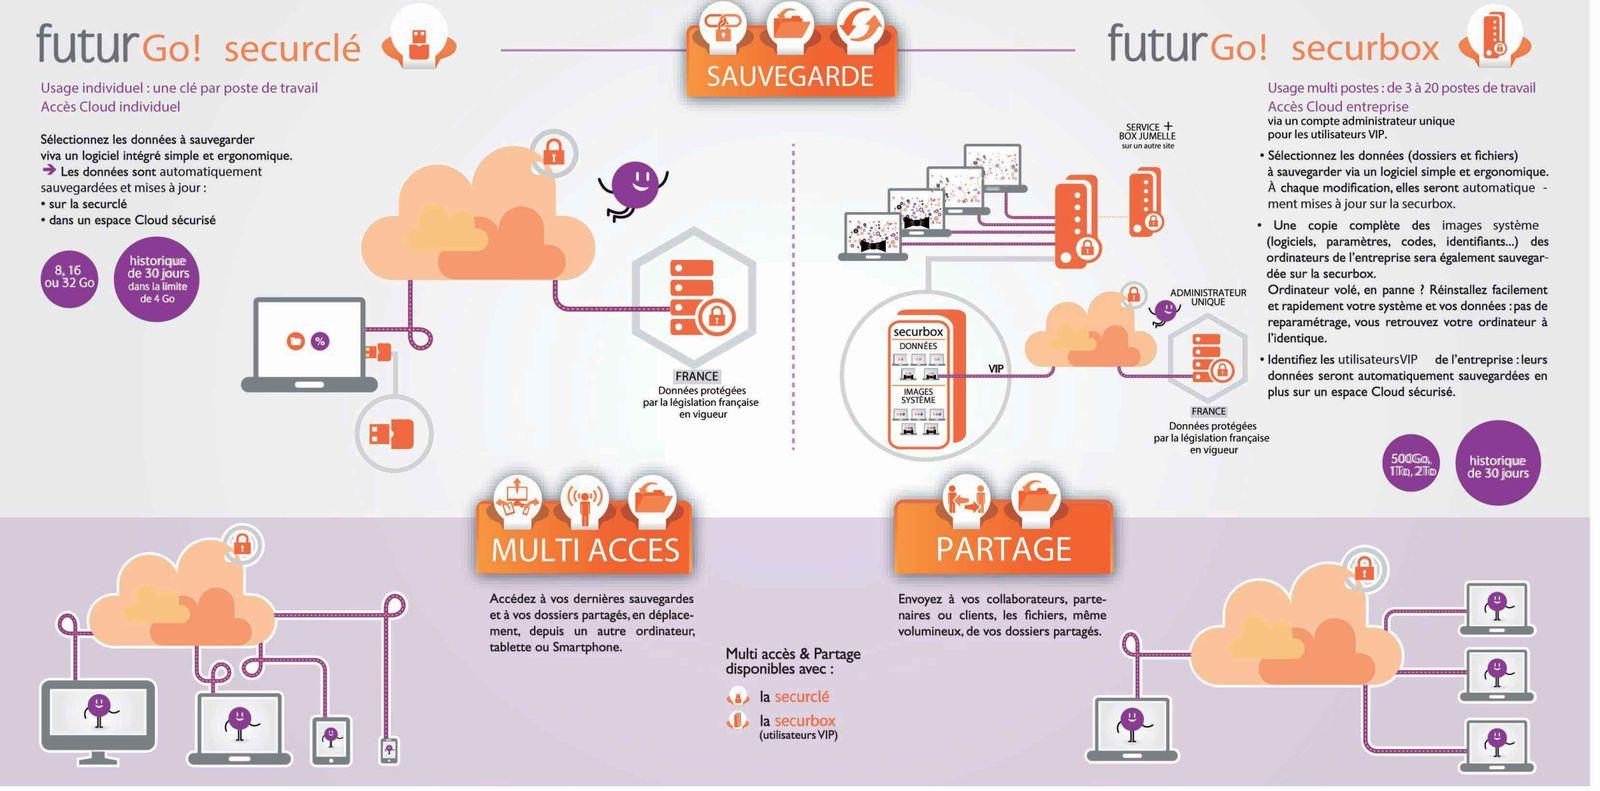 Le cloud selon futur telecom. C'est quoi ! Futur Go !